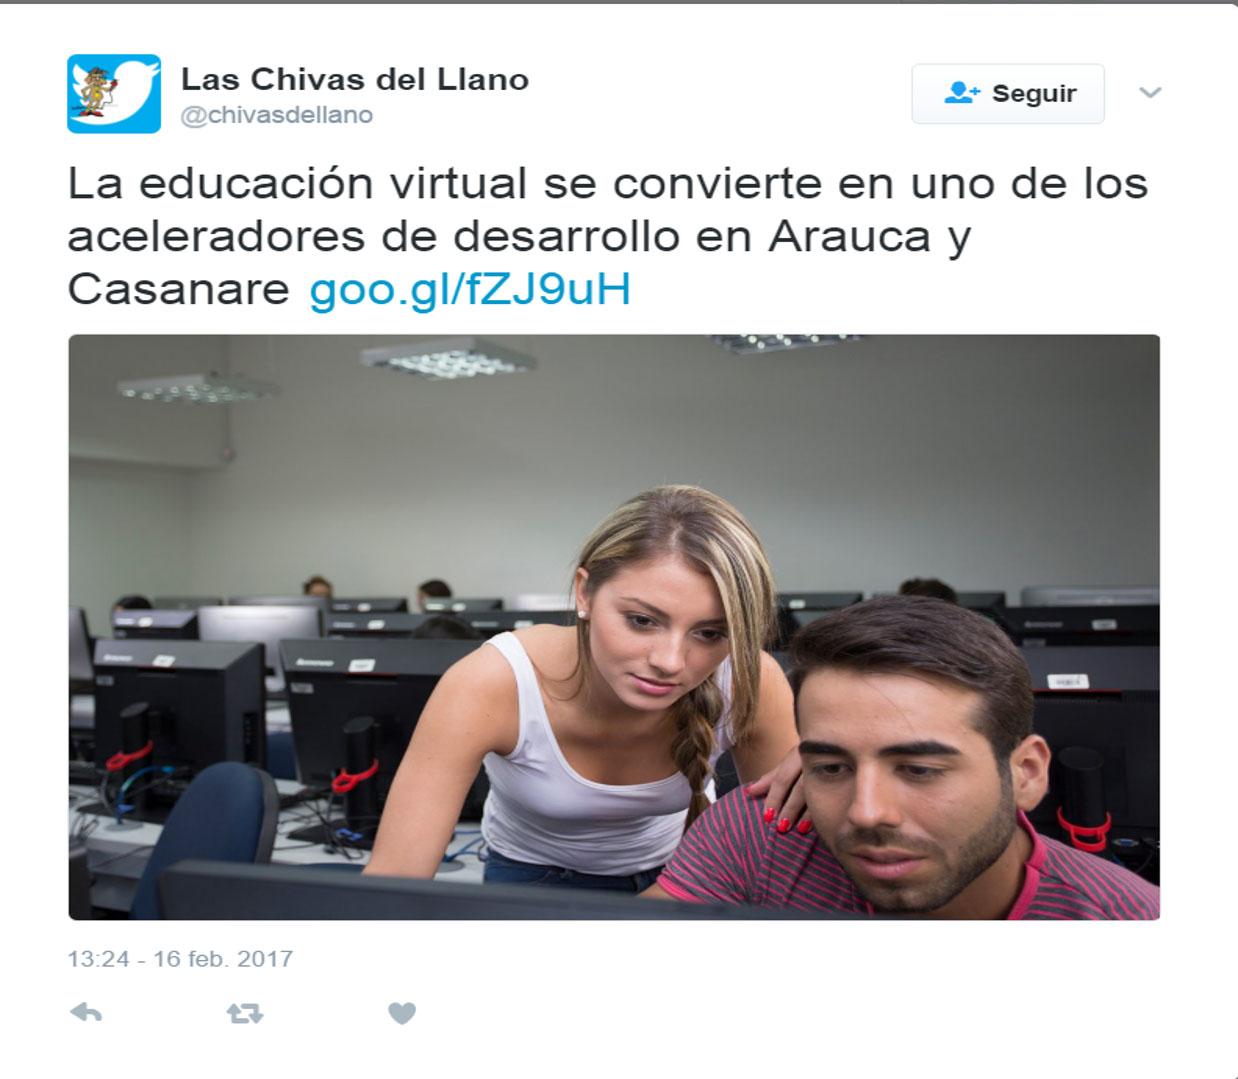 Las Chivas del llano twitter